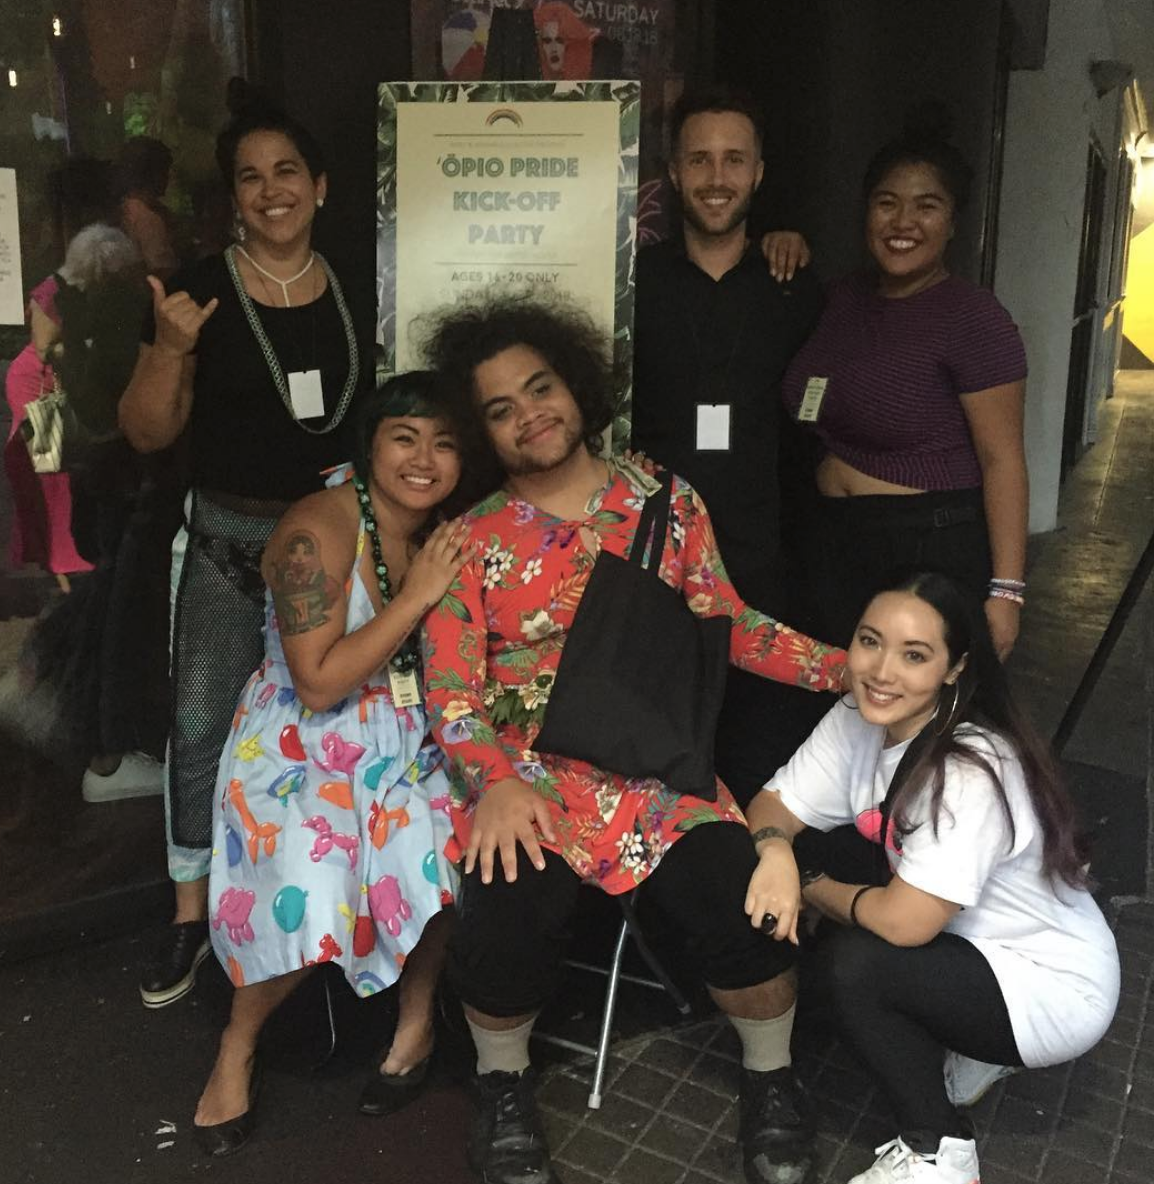 (L to R) Pumehana Cabral, Marie Eriel Hobro, Chris Emory, Jared Perez,  Dulce Ramos, and Maya Uemoto